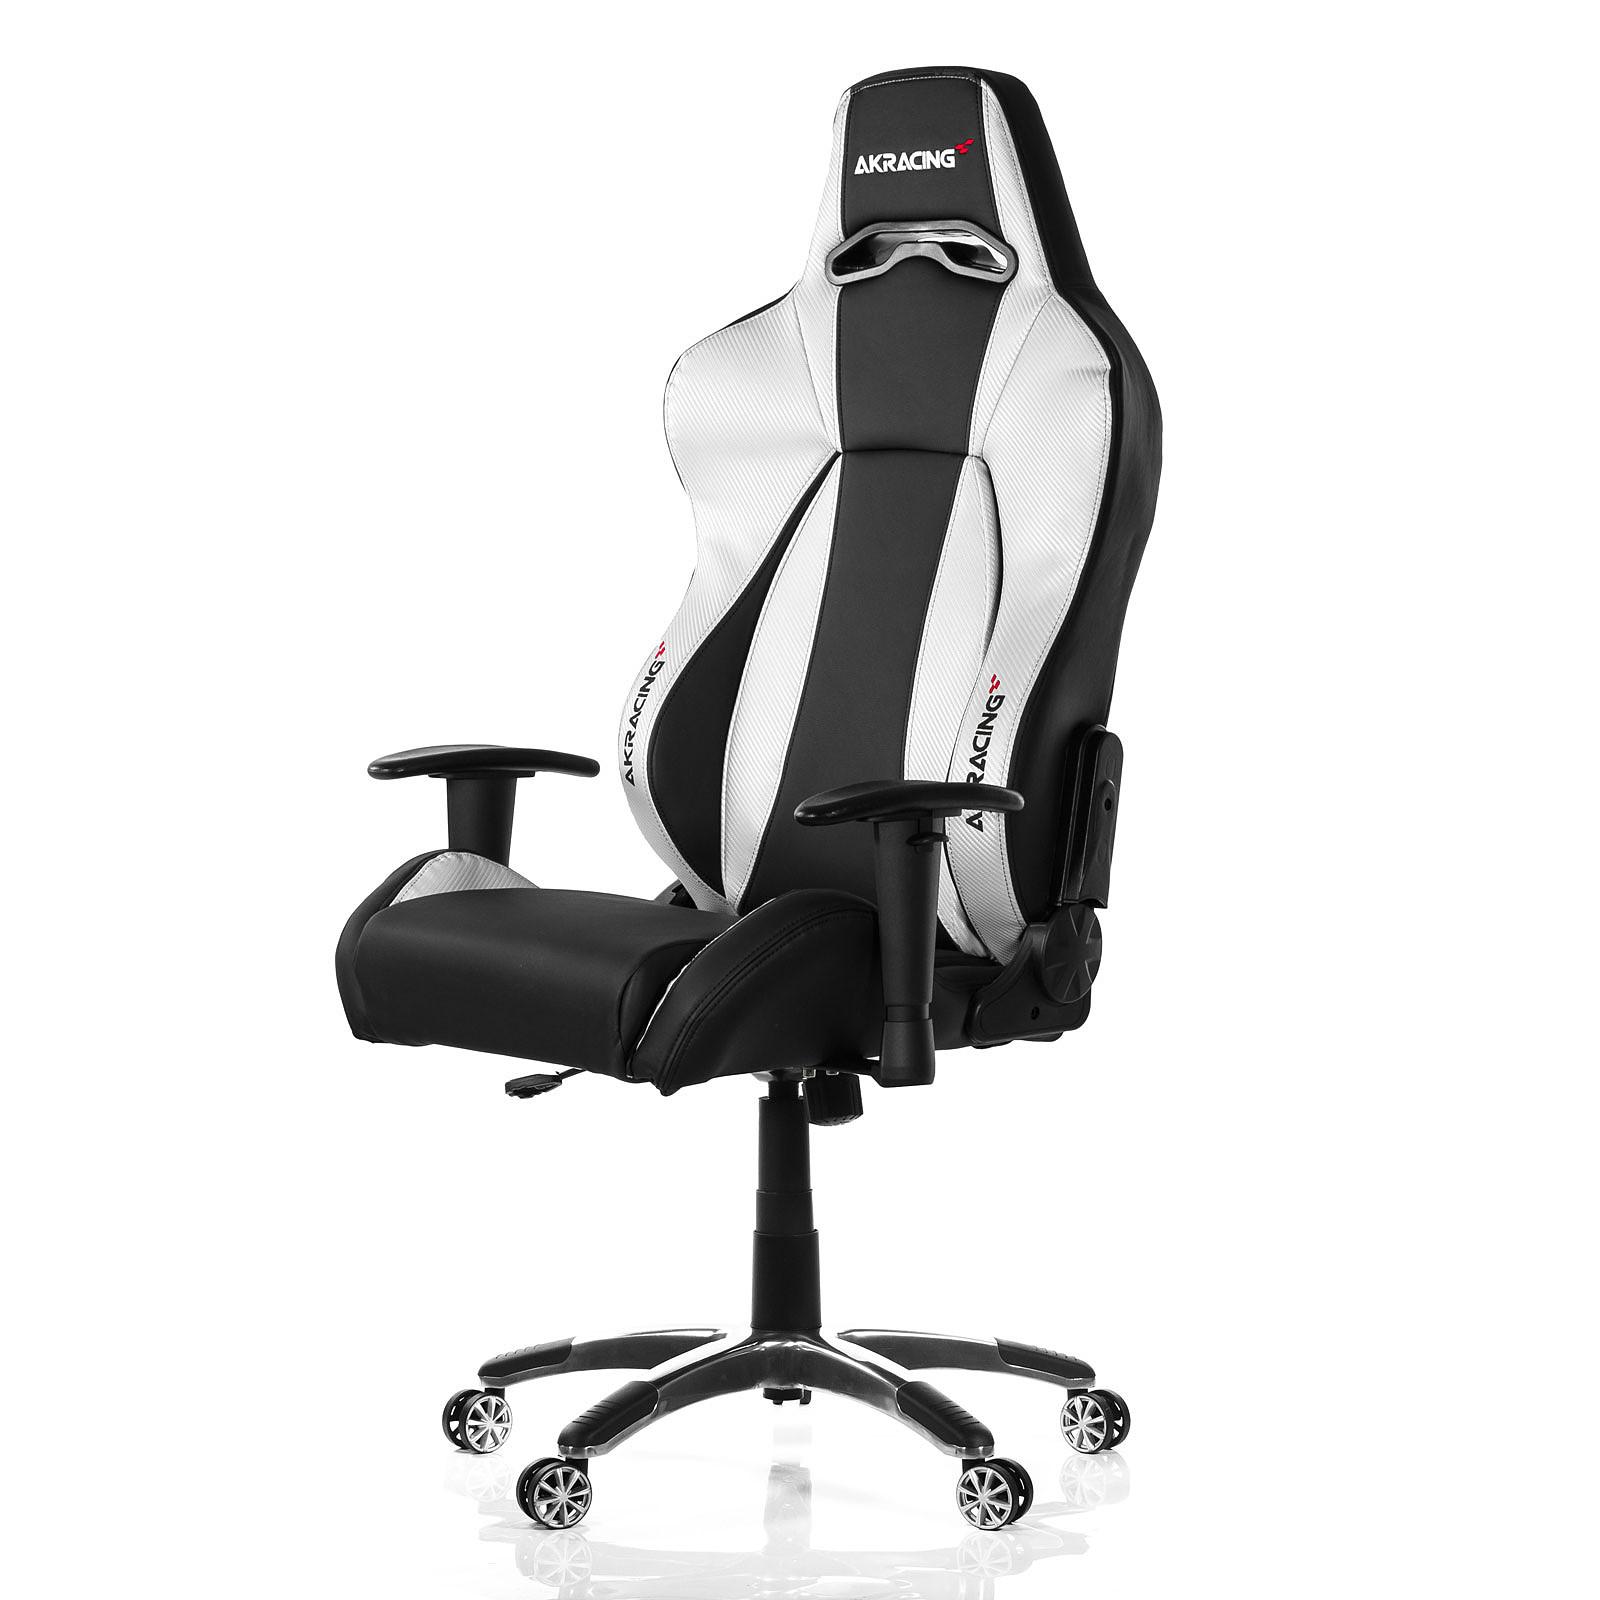 AKRacing Premium Gaming Chair (argent)